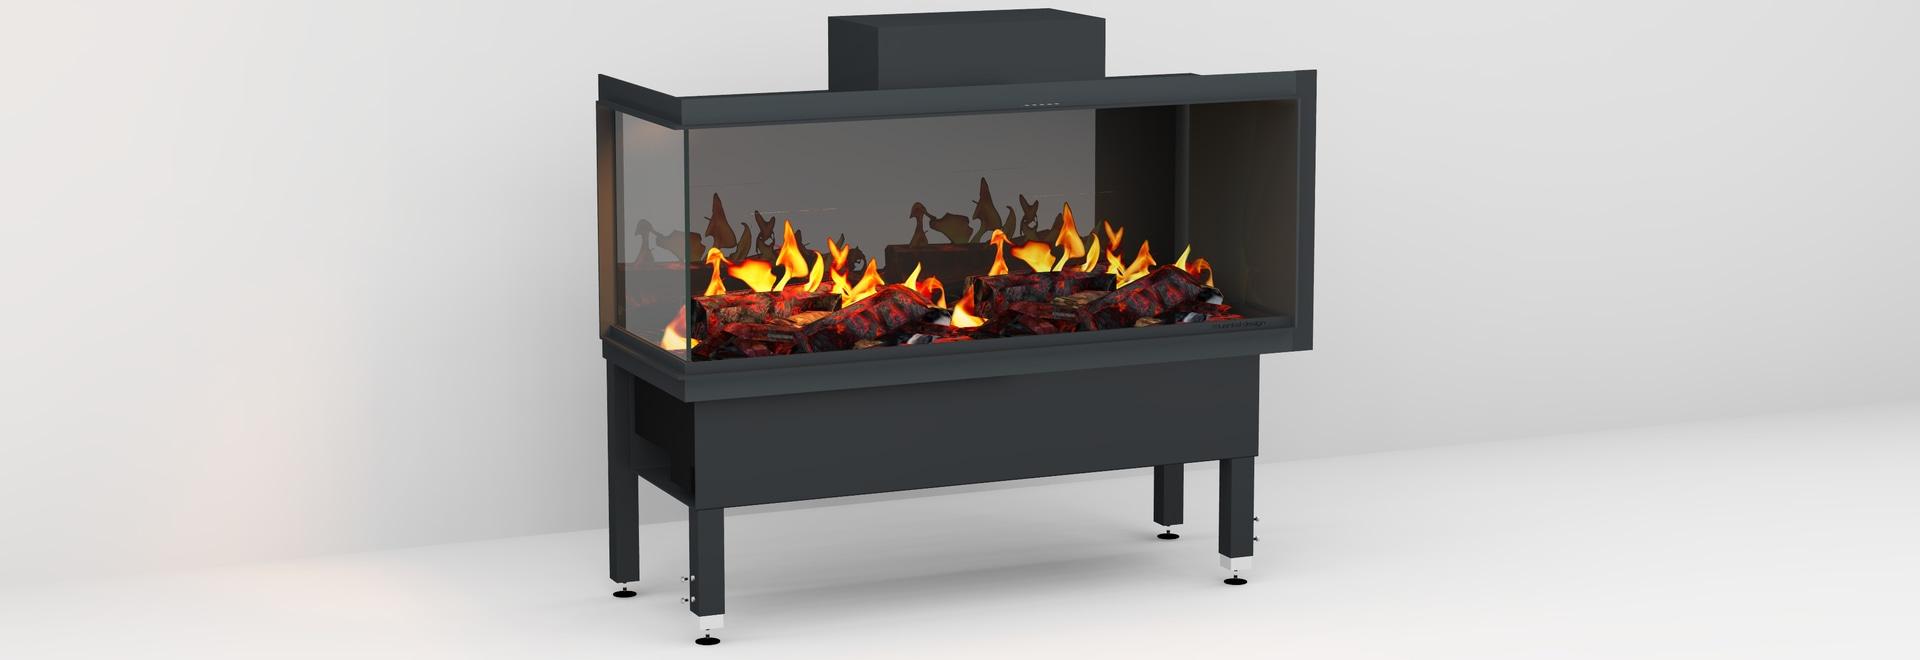 muenkel design wall fire electronic PRO FL / FR [Opti-myst electric fireplace insert wall installation]